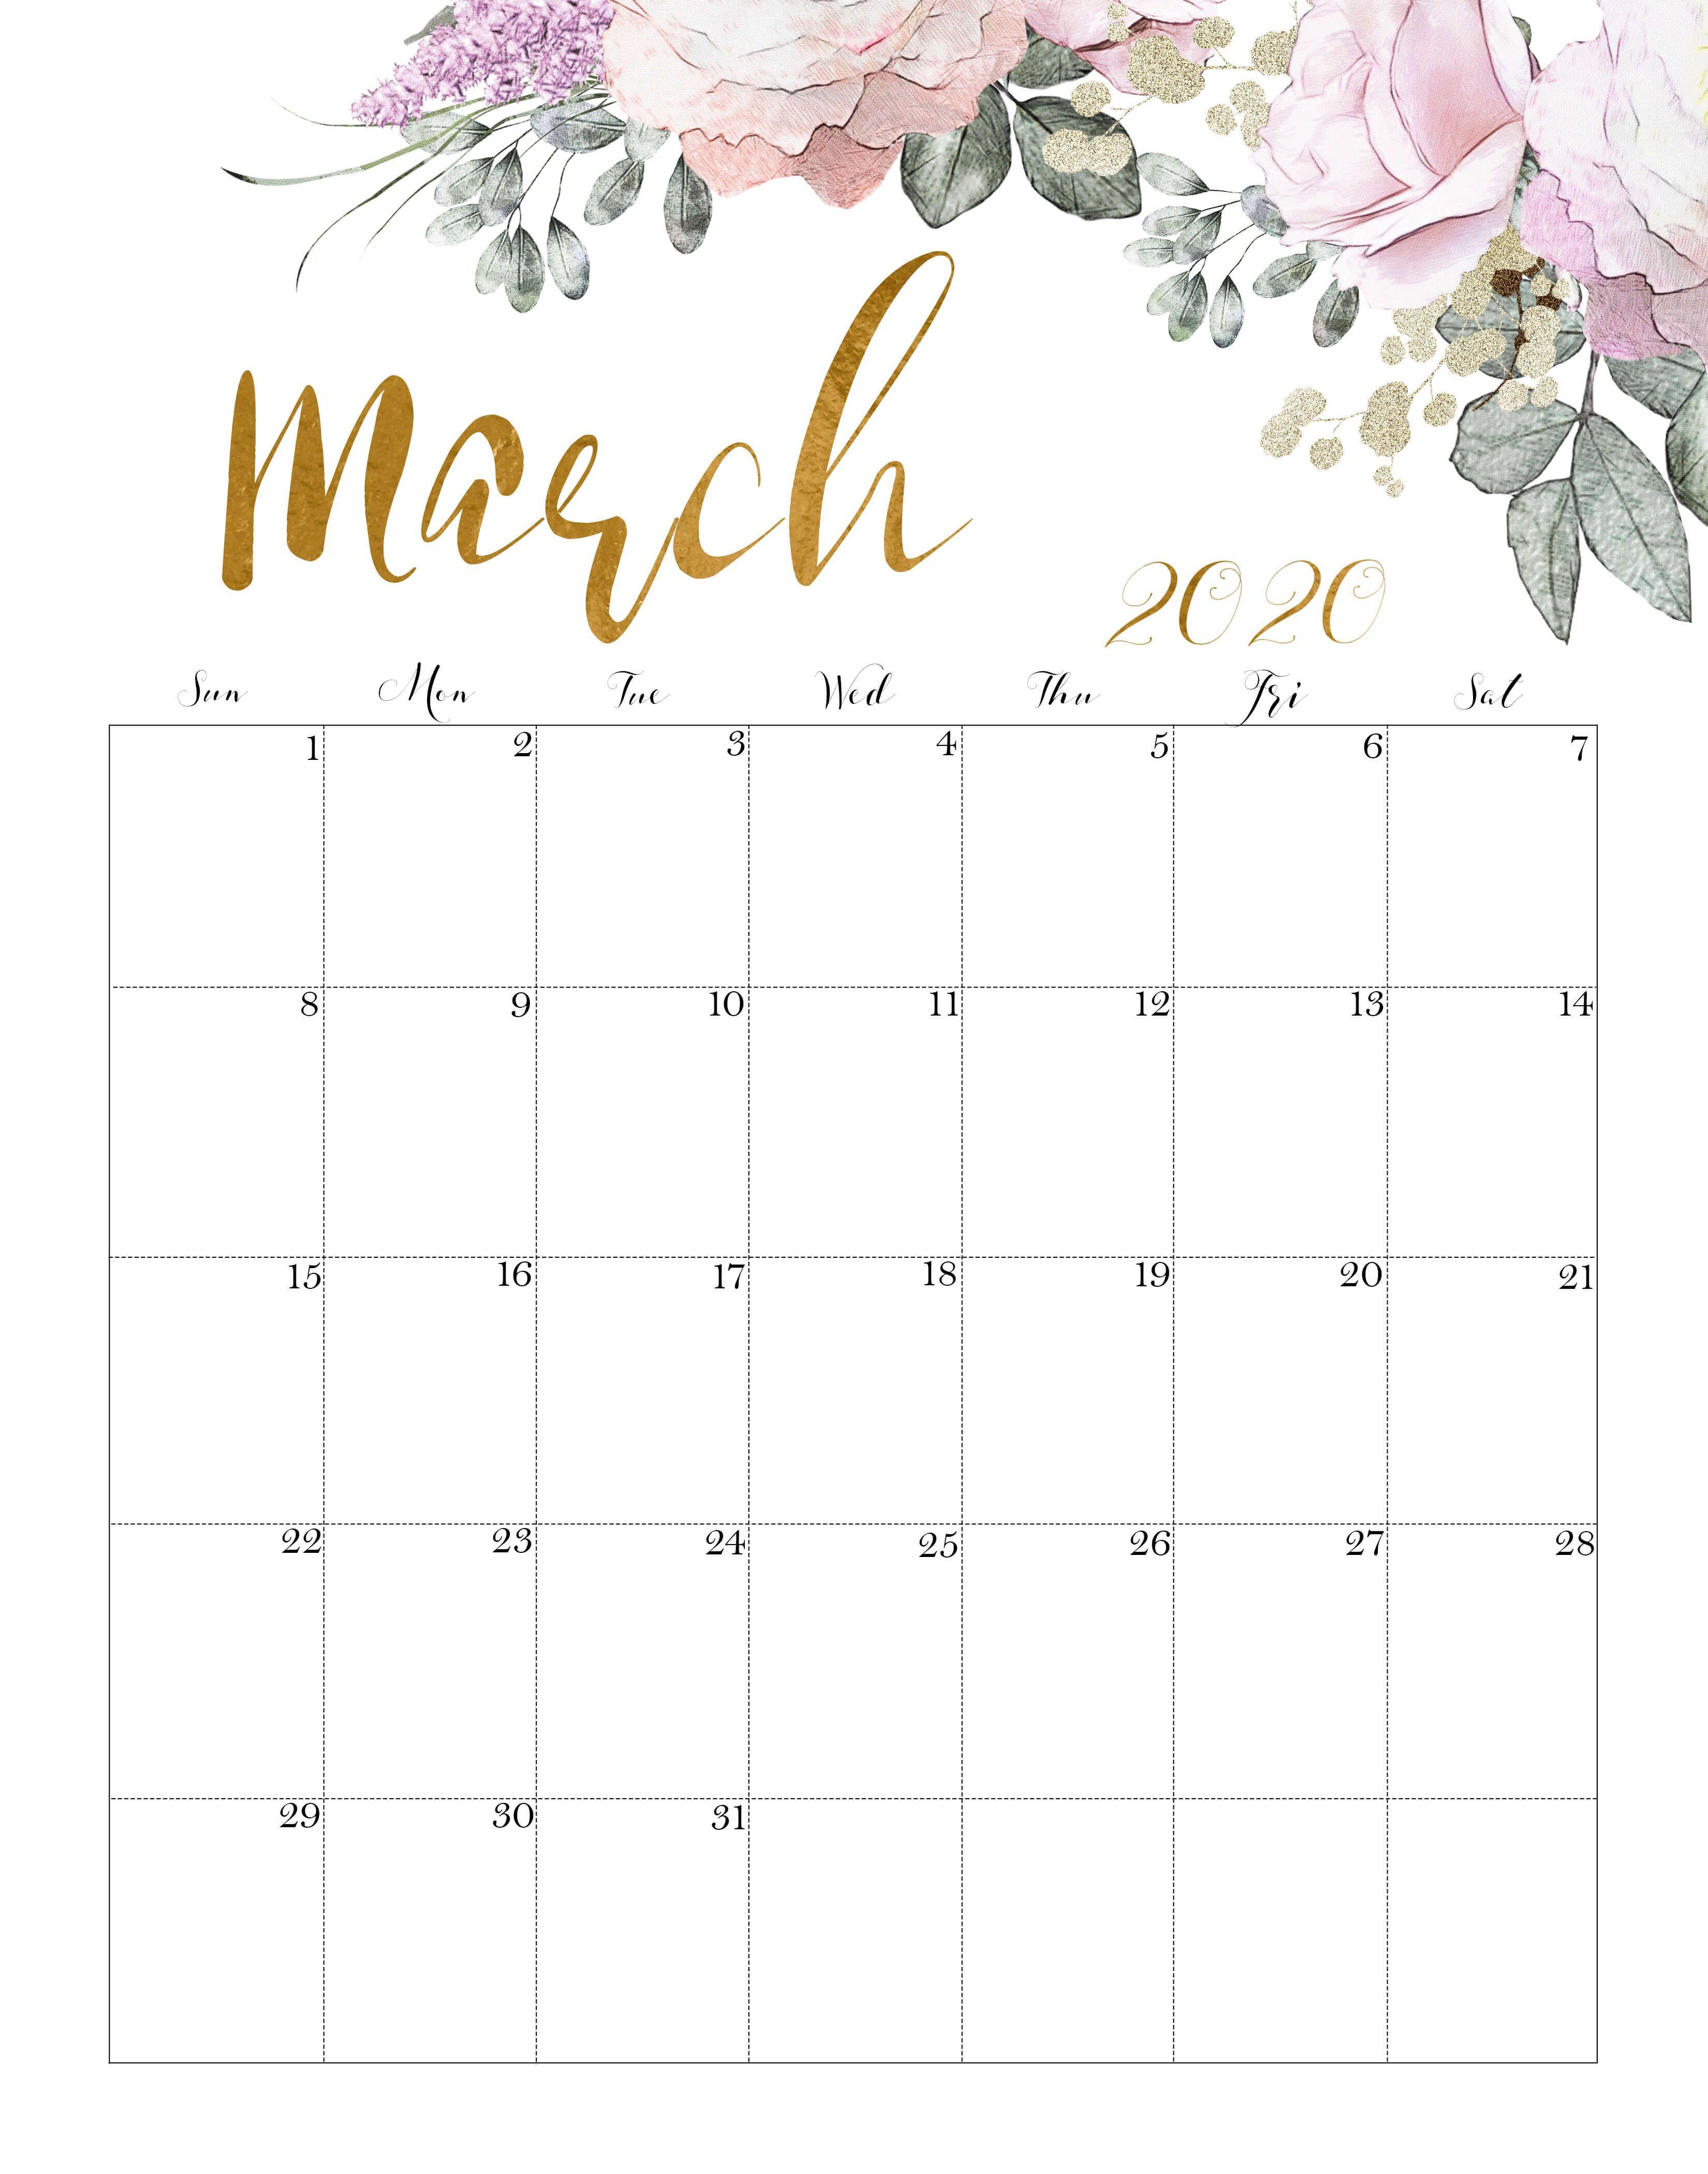 Floral March 2020 Calendar In 2020 March Calendar Printable Free Printable Calendar Free Calendar Template